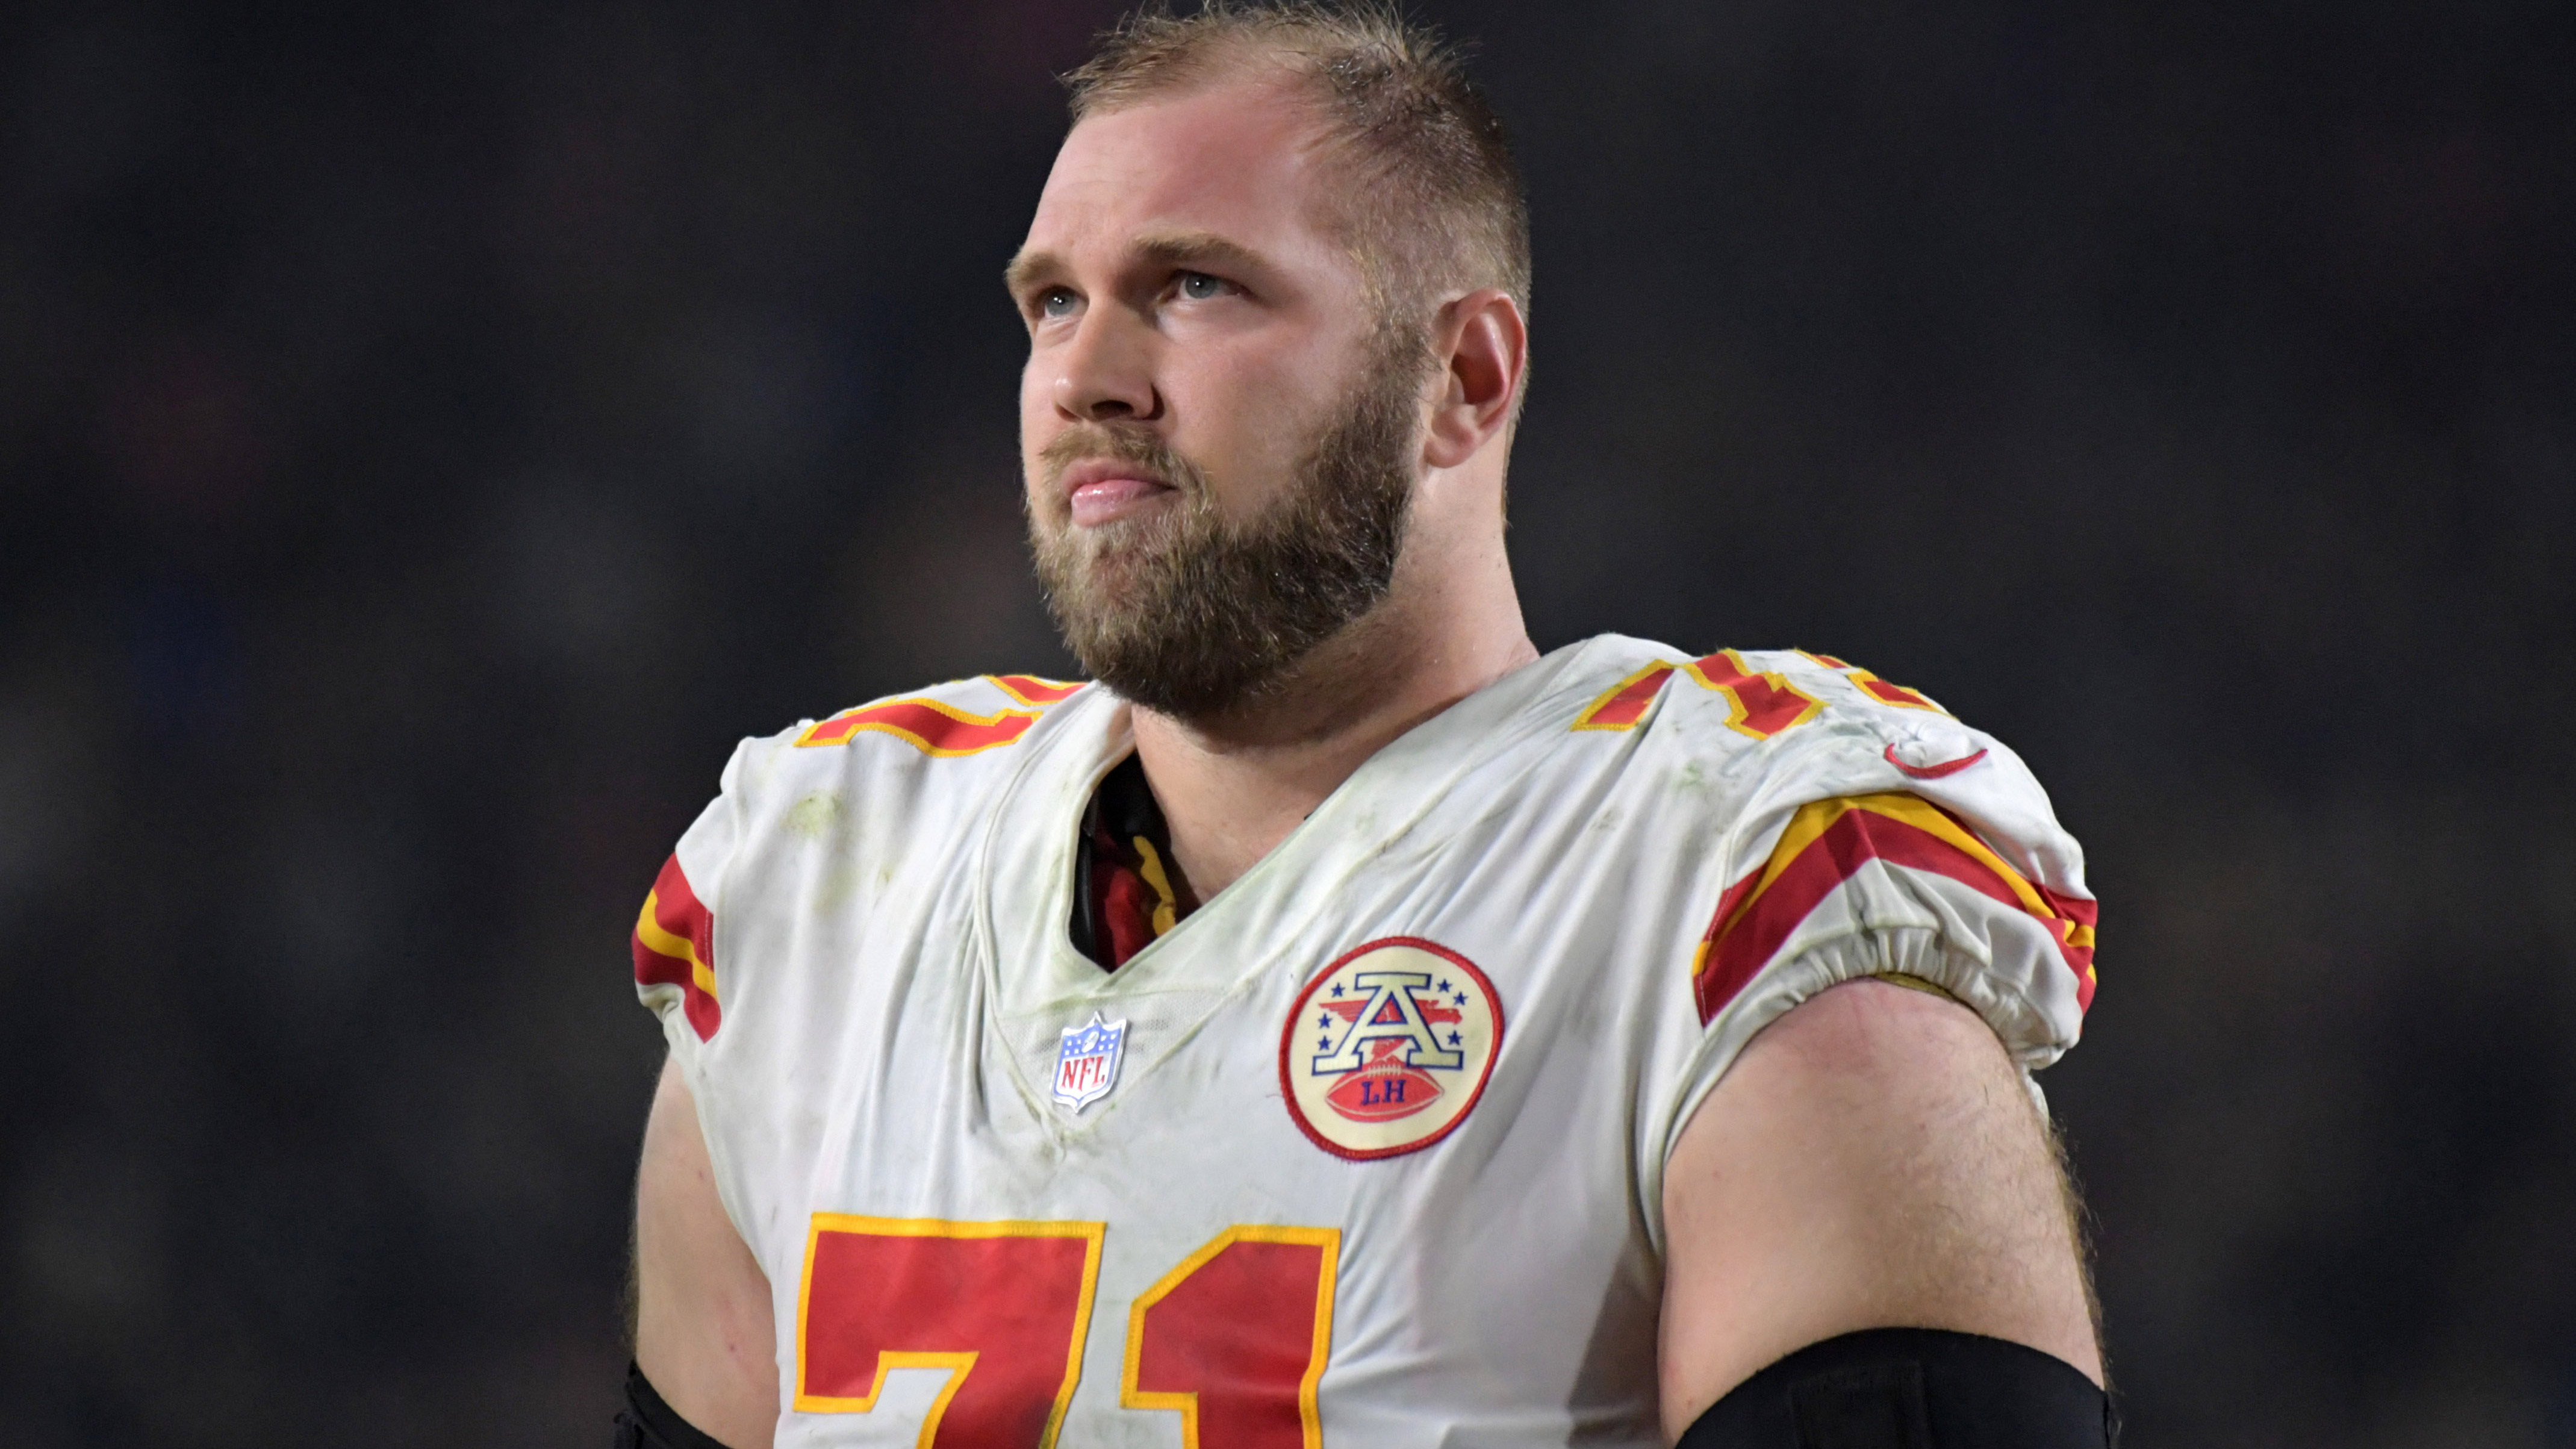 Chiefs sign All-Pro OT Schwartz to one-year extension through 2021